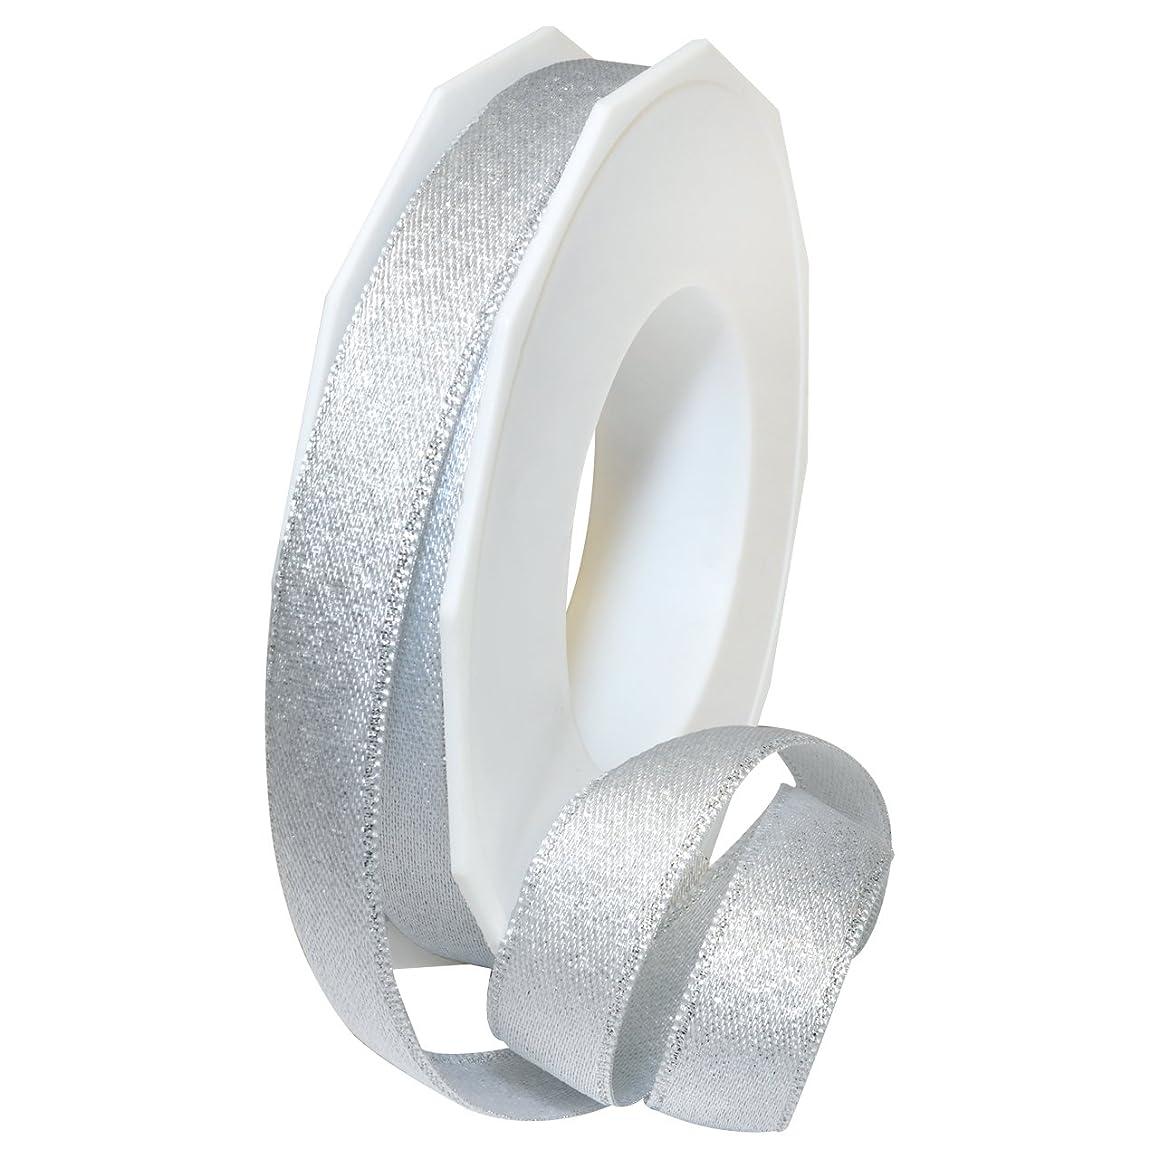 Morex Ribbon 67915/20-601 Glitter Satin Polyester Ribbon, 5/8